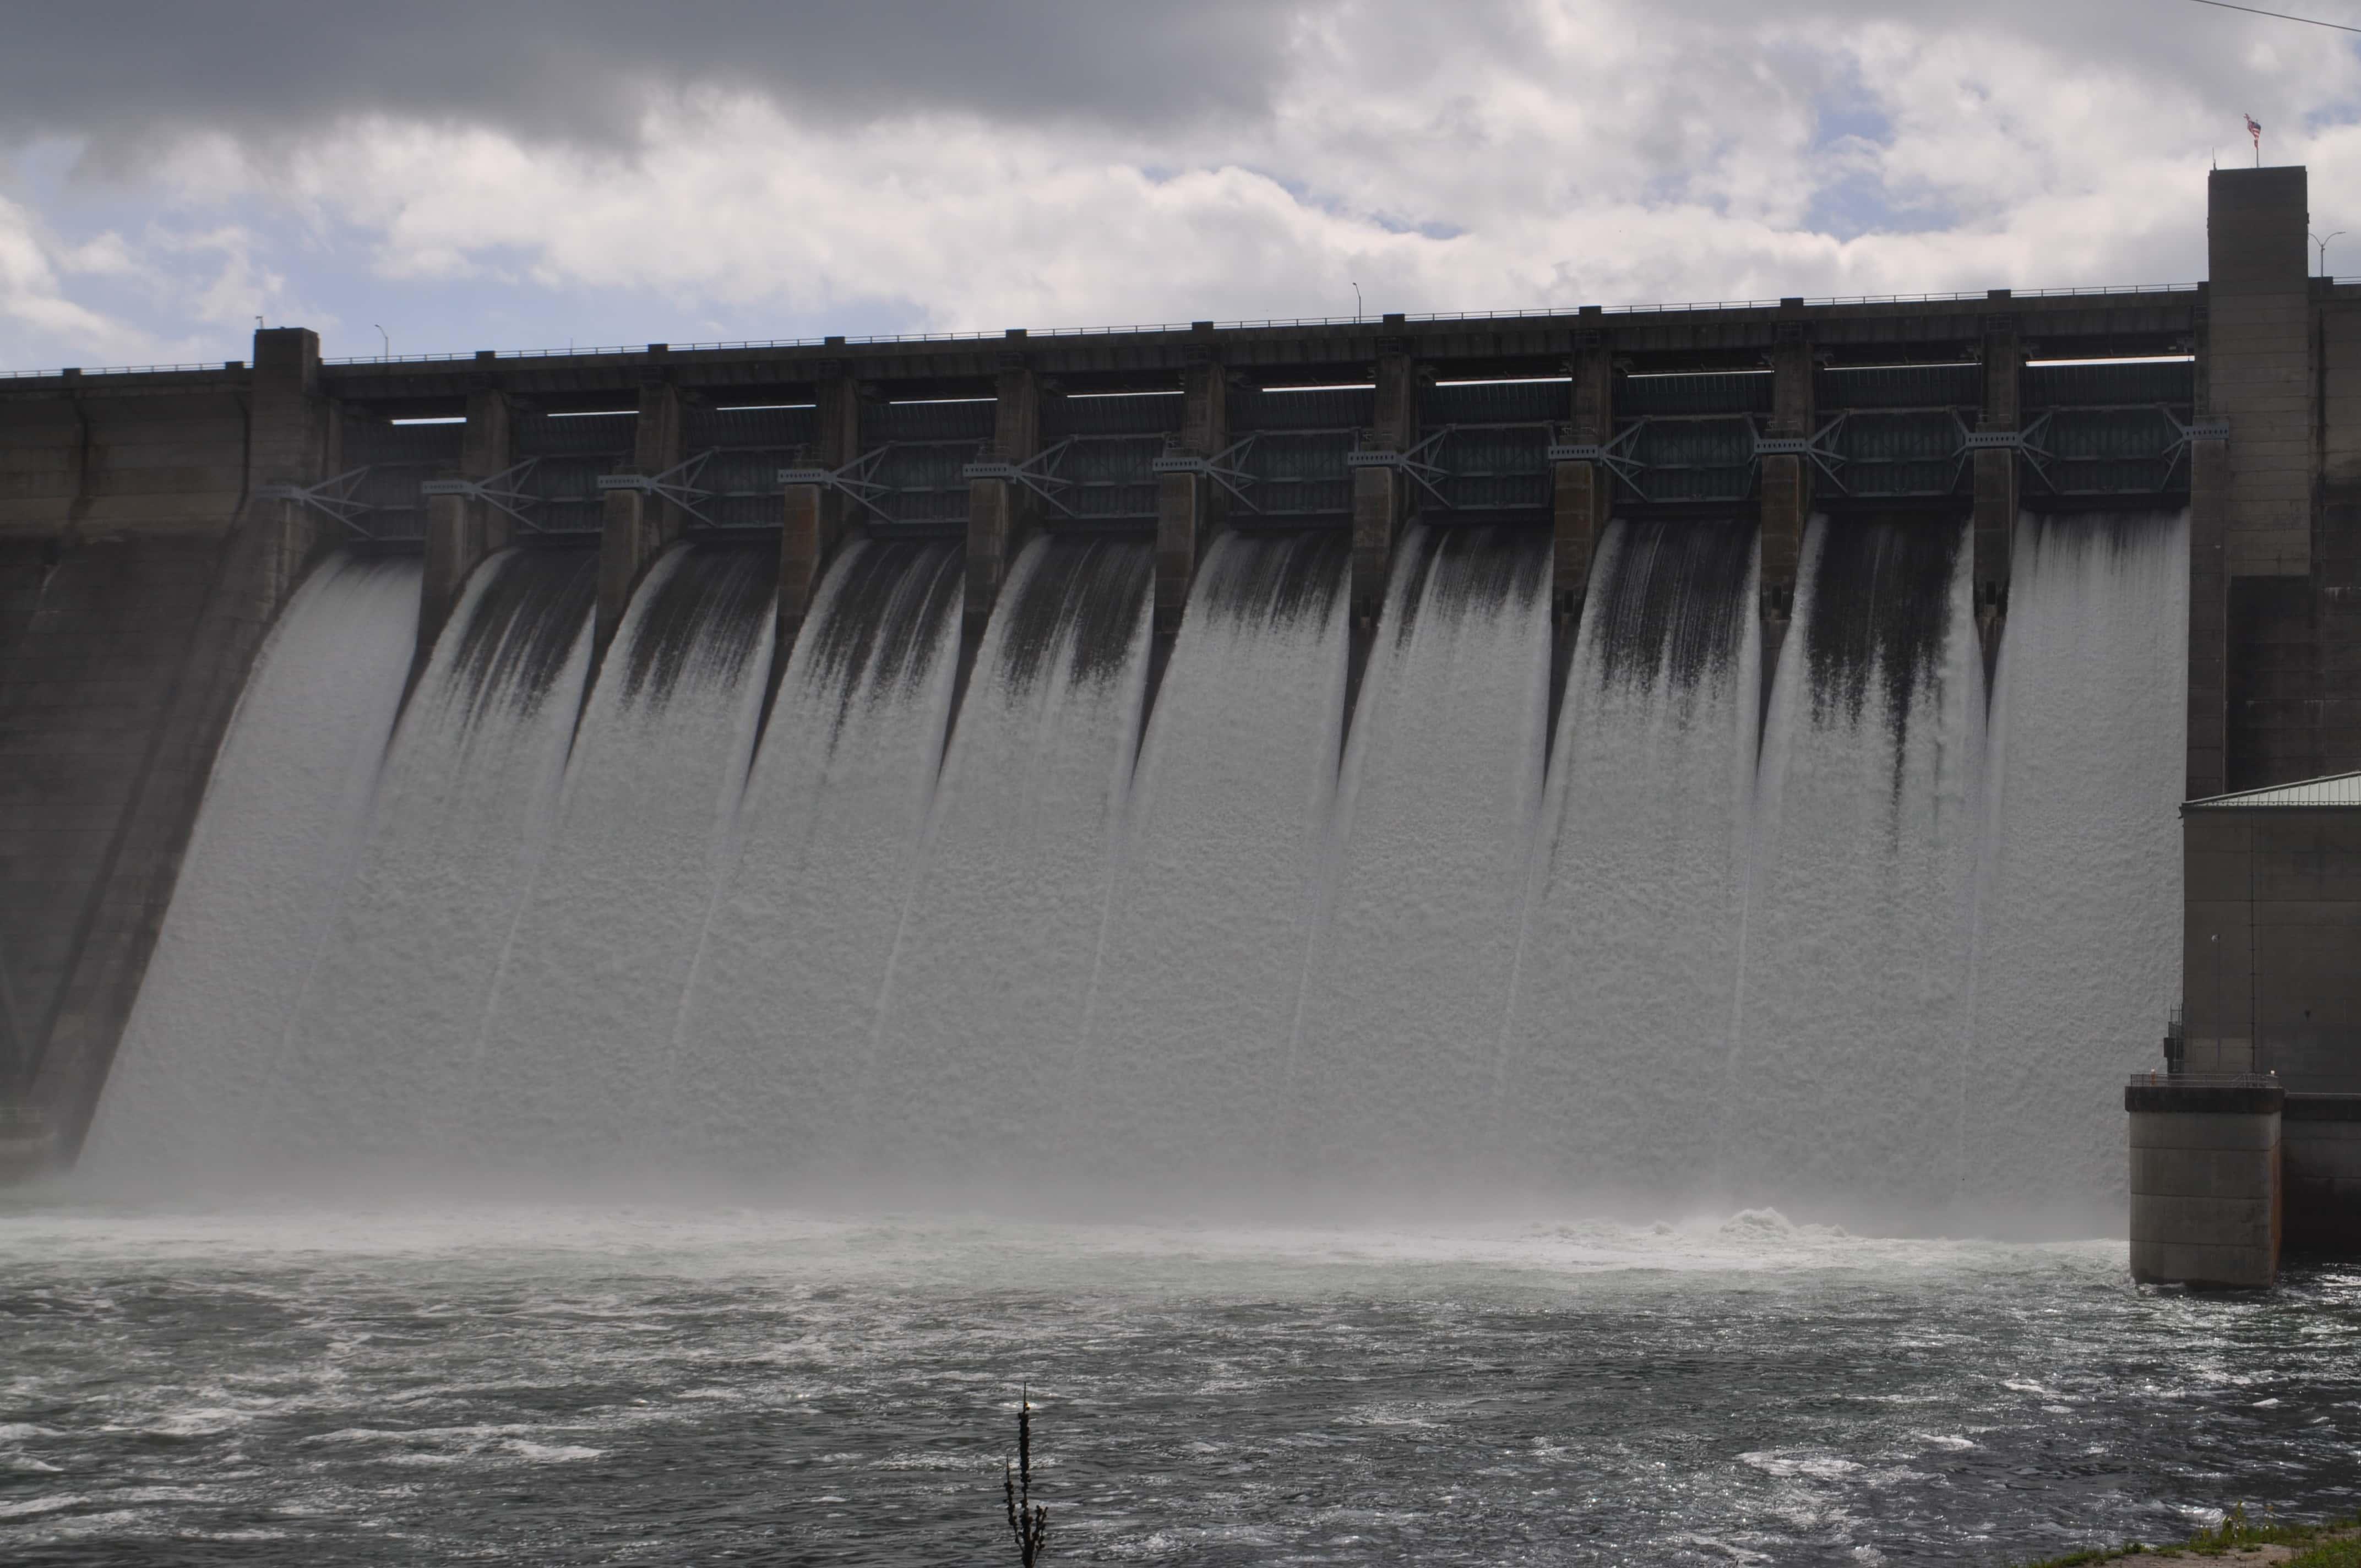 table rock dam opens spillways for turbine maintenance